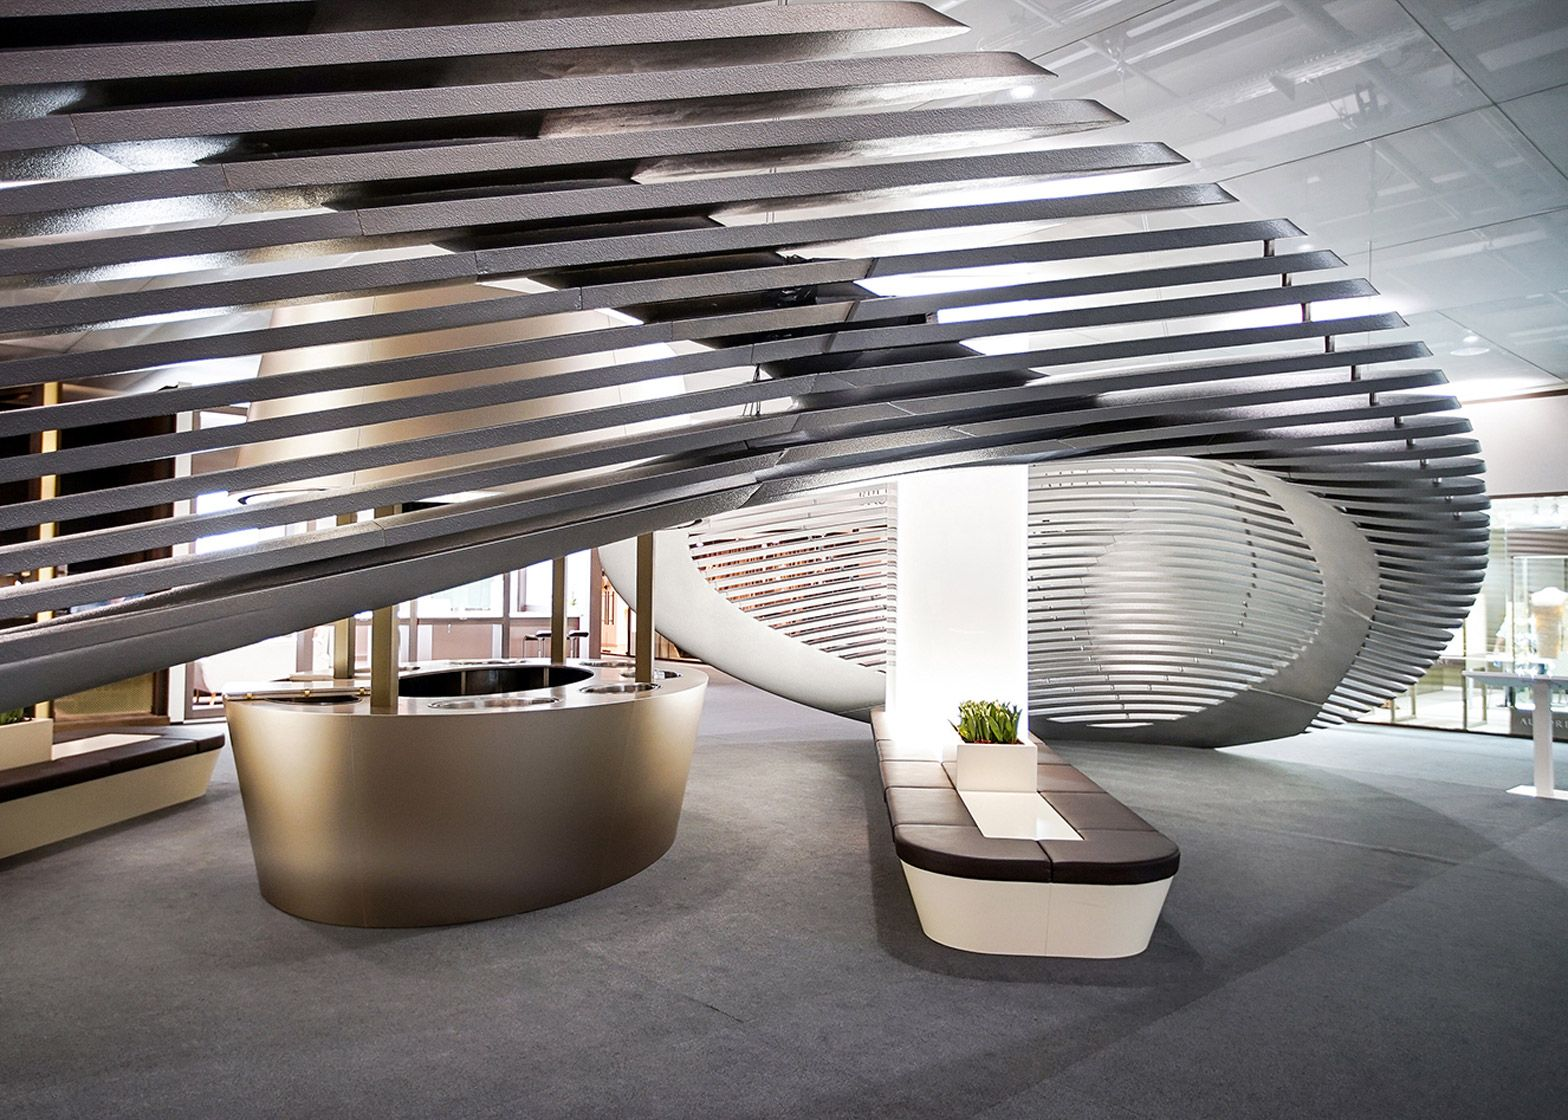 Georg Jensenu0027s Baselworld Installation Designed By Zaha Hadid